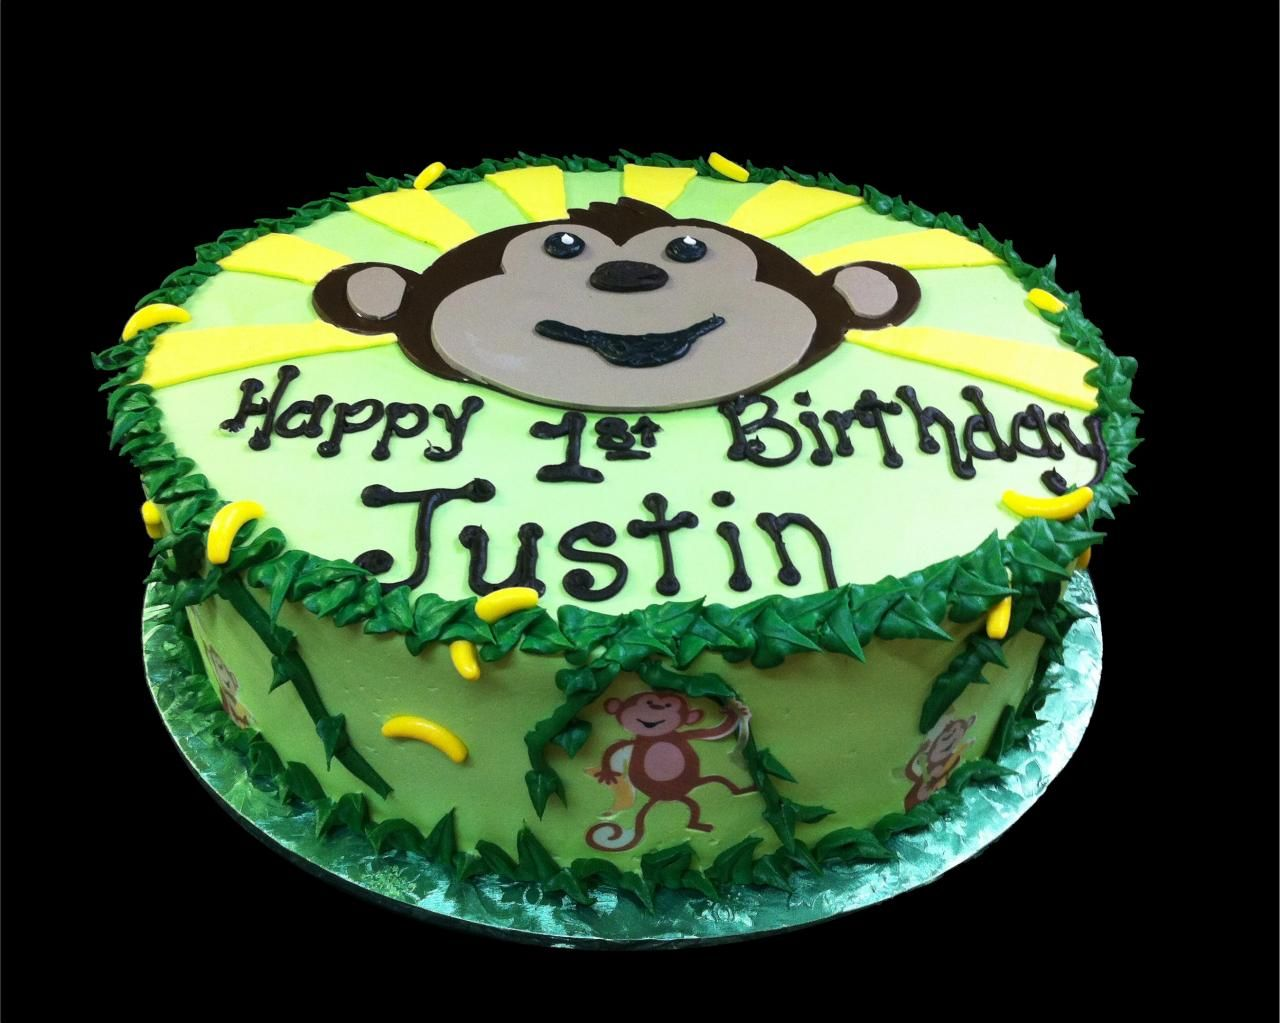 Monkey See Monkey Do 1st Birthday Cake, Green Buttercream